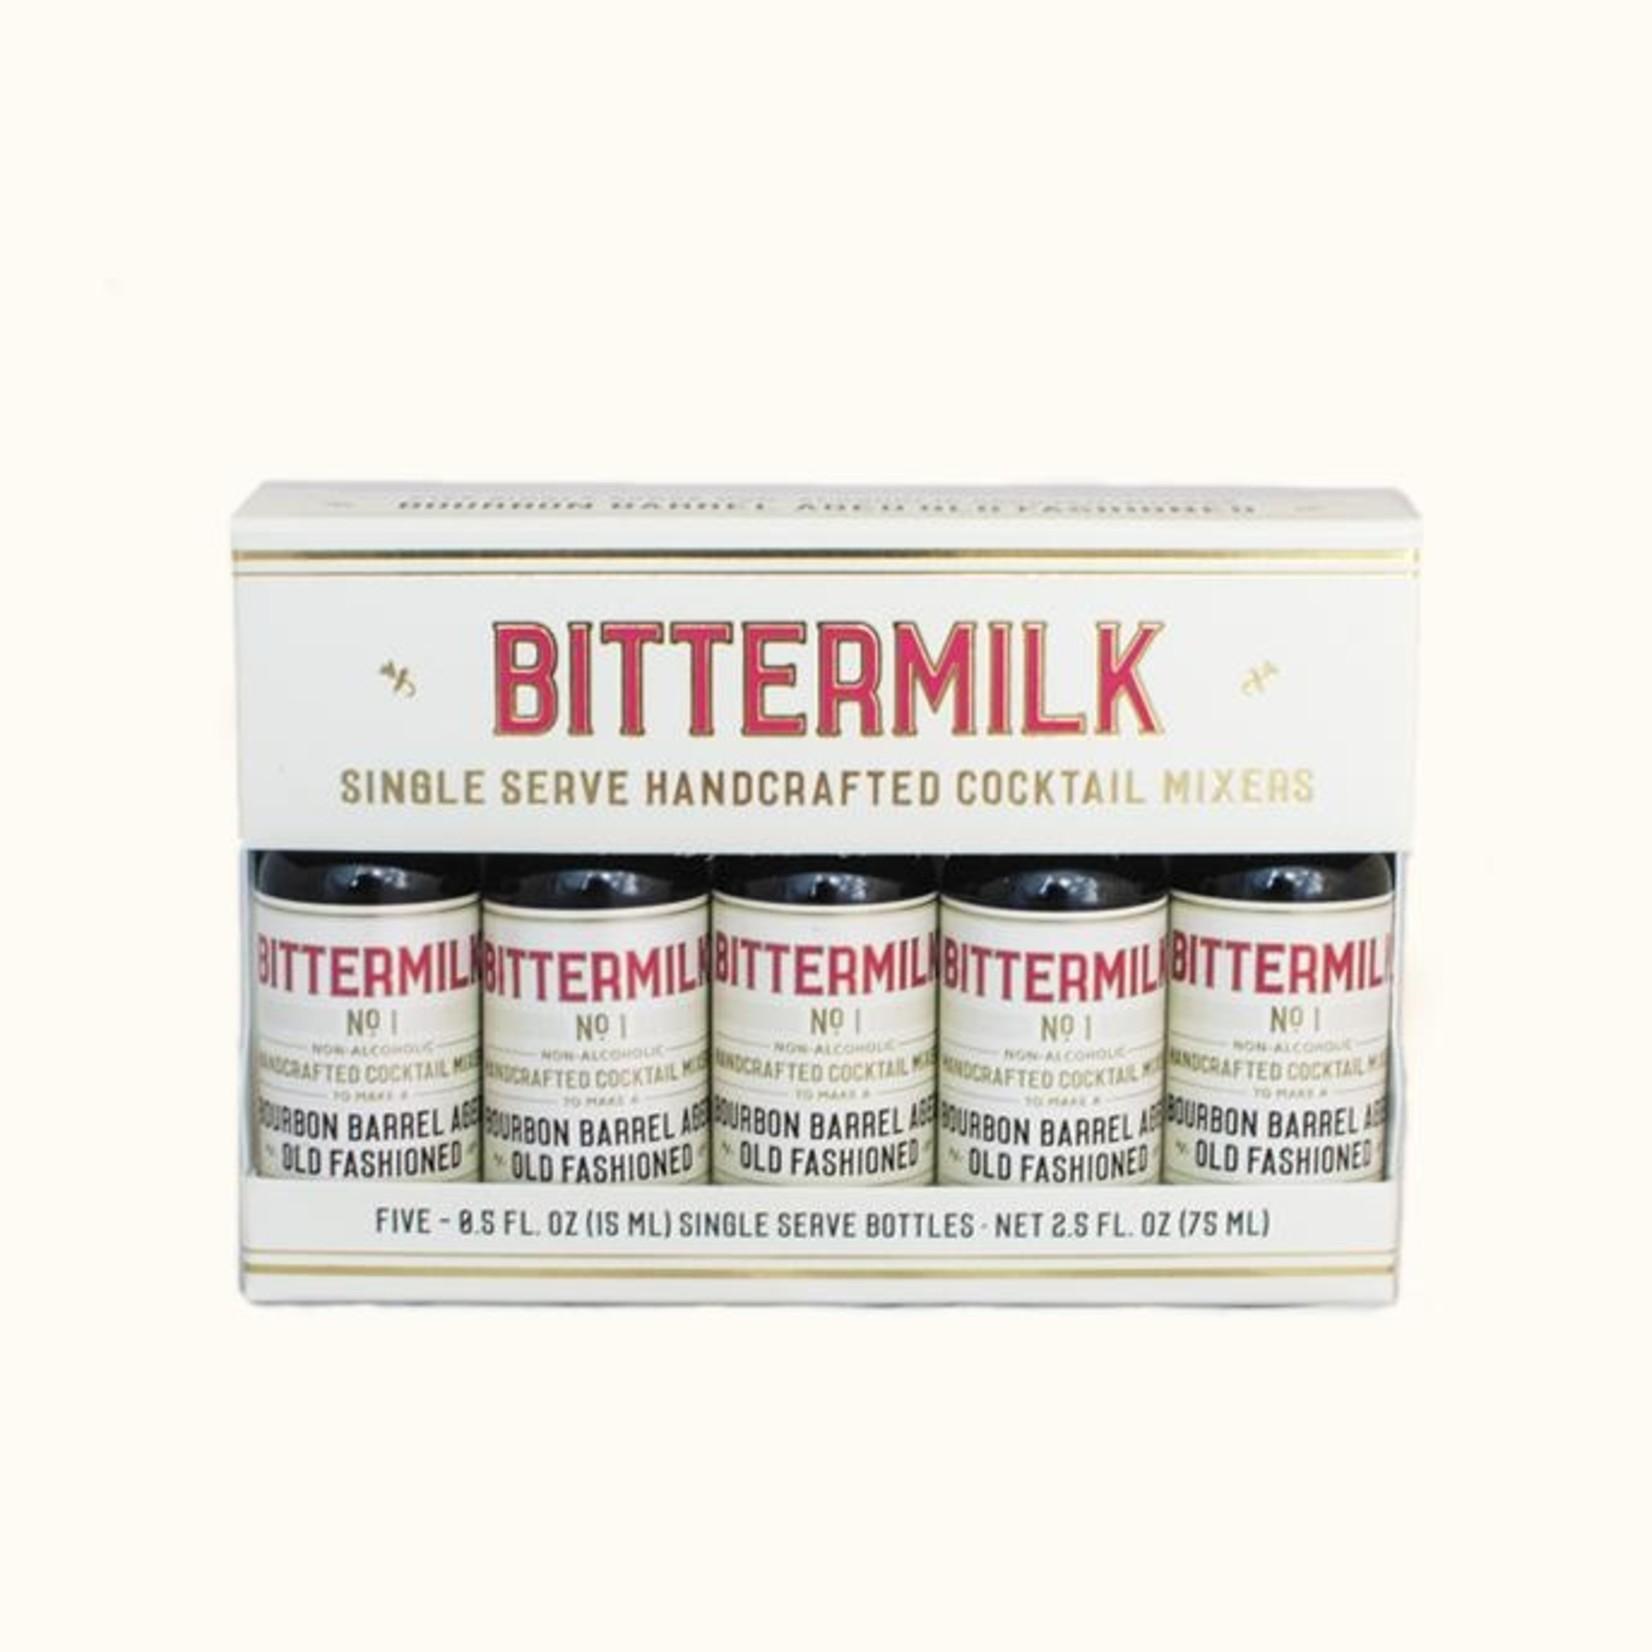 Bittermilk Single Serve Bourbon Barrel Aged Old Fashioned 5-pack